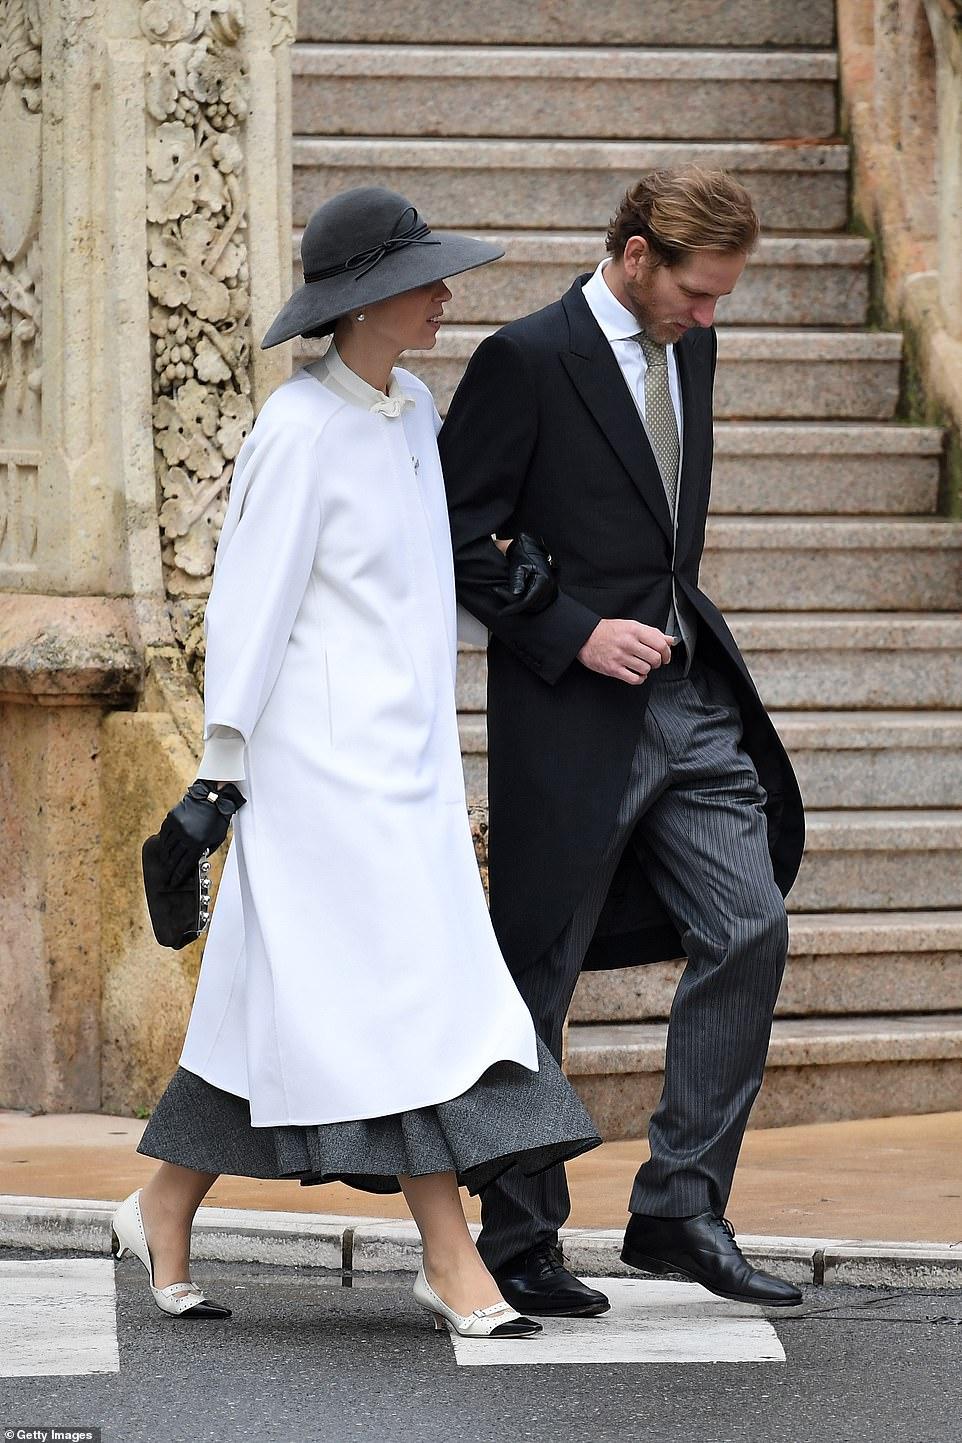 Tatiana Santo Domingo and Andrea Casiraghi arrive at the Monaco Cathedral